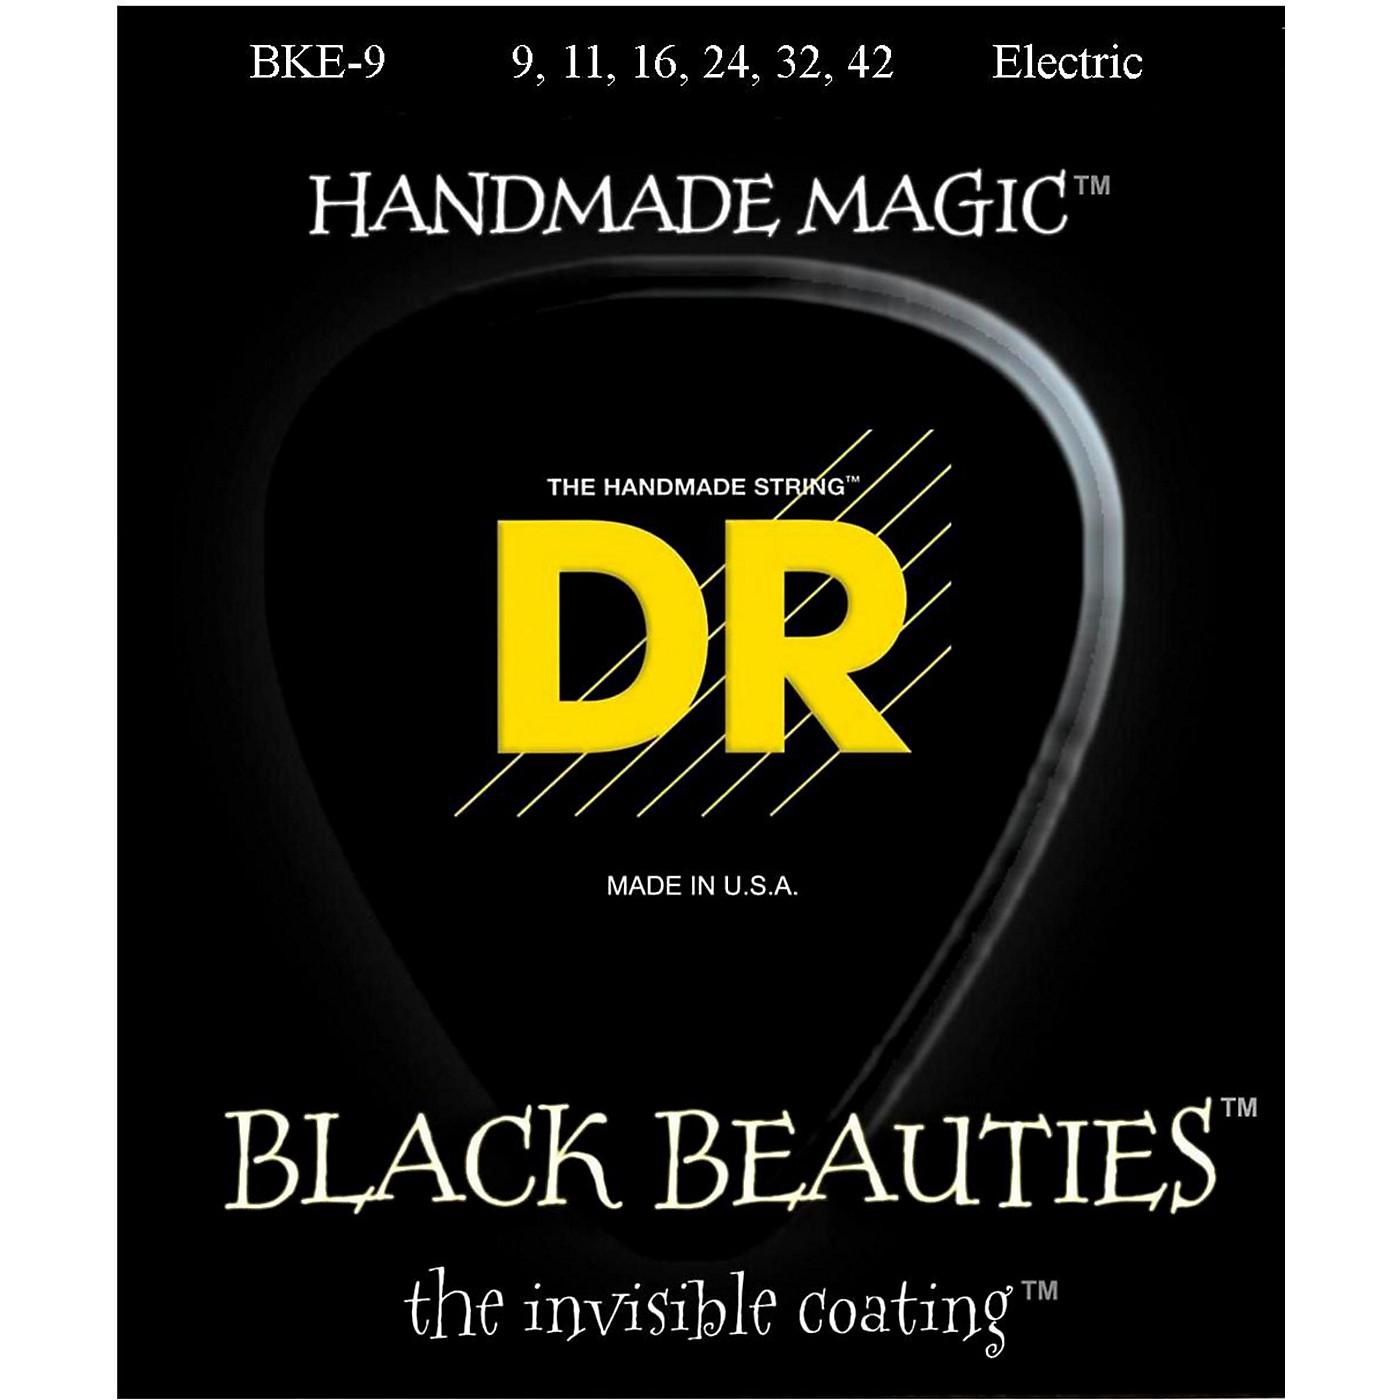 DR Strings Extra Life BKE-9 Black Beauties Lite Coated Electric Guitar Strings thumbnail